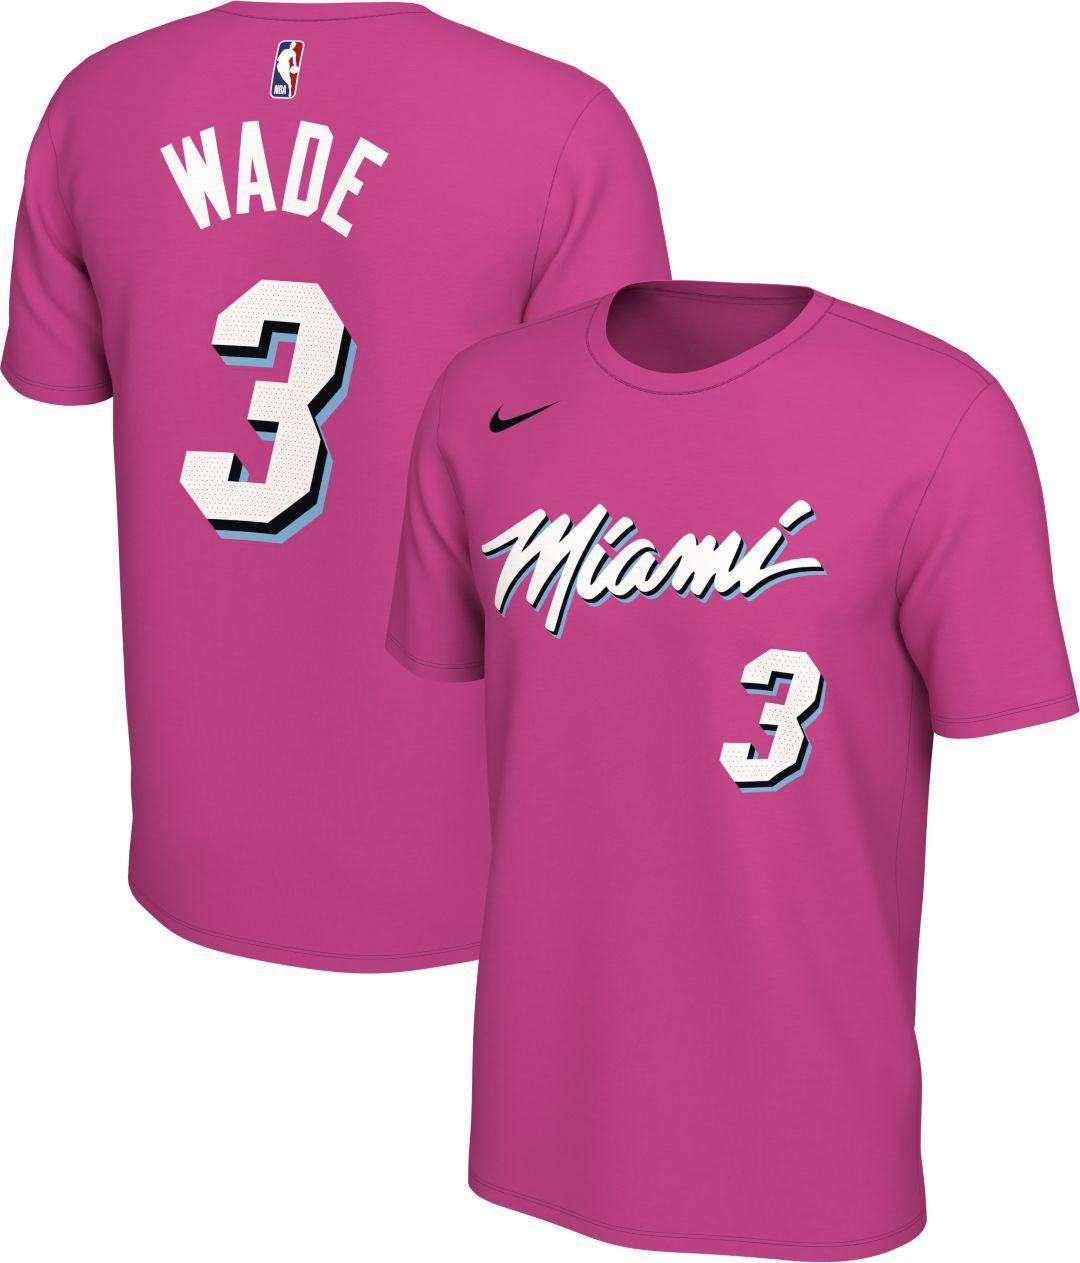 b5a9df40 Nike Men's Miami Heat Dwyane Wade Dri-FIT Earned Edition T-Shirt ...